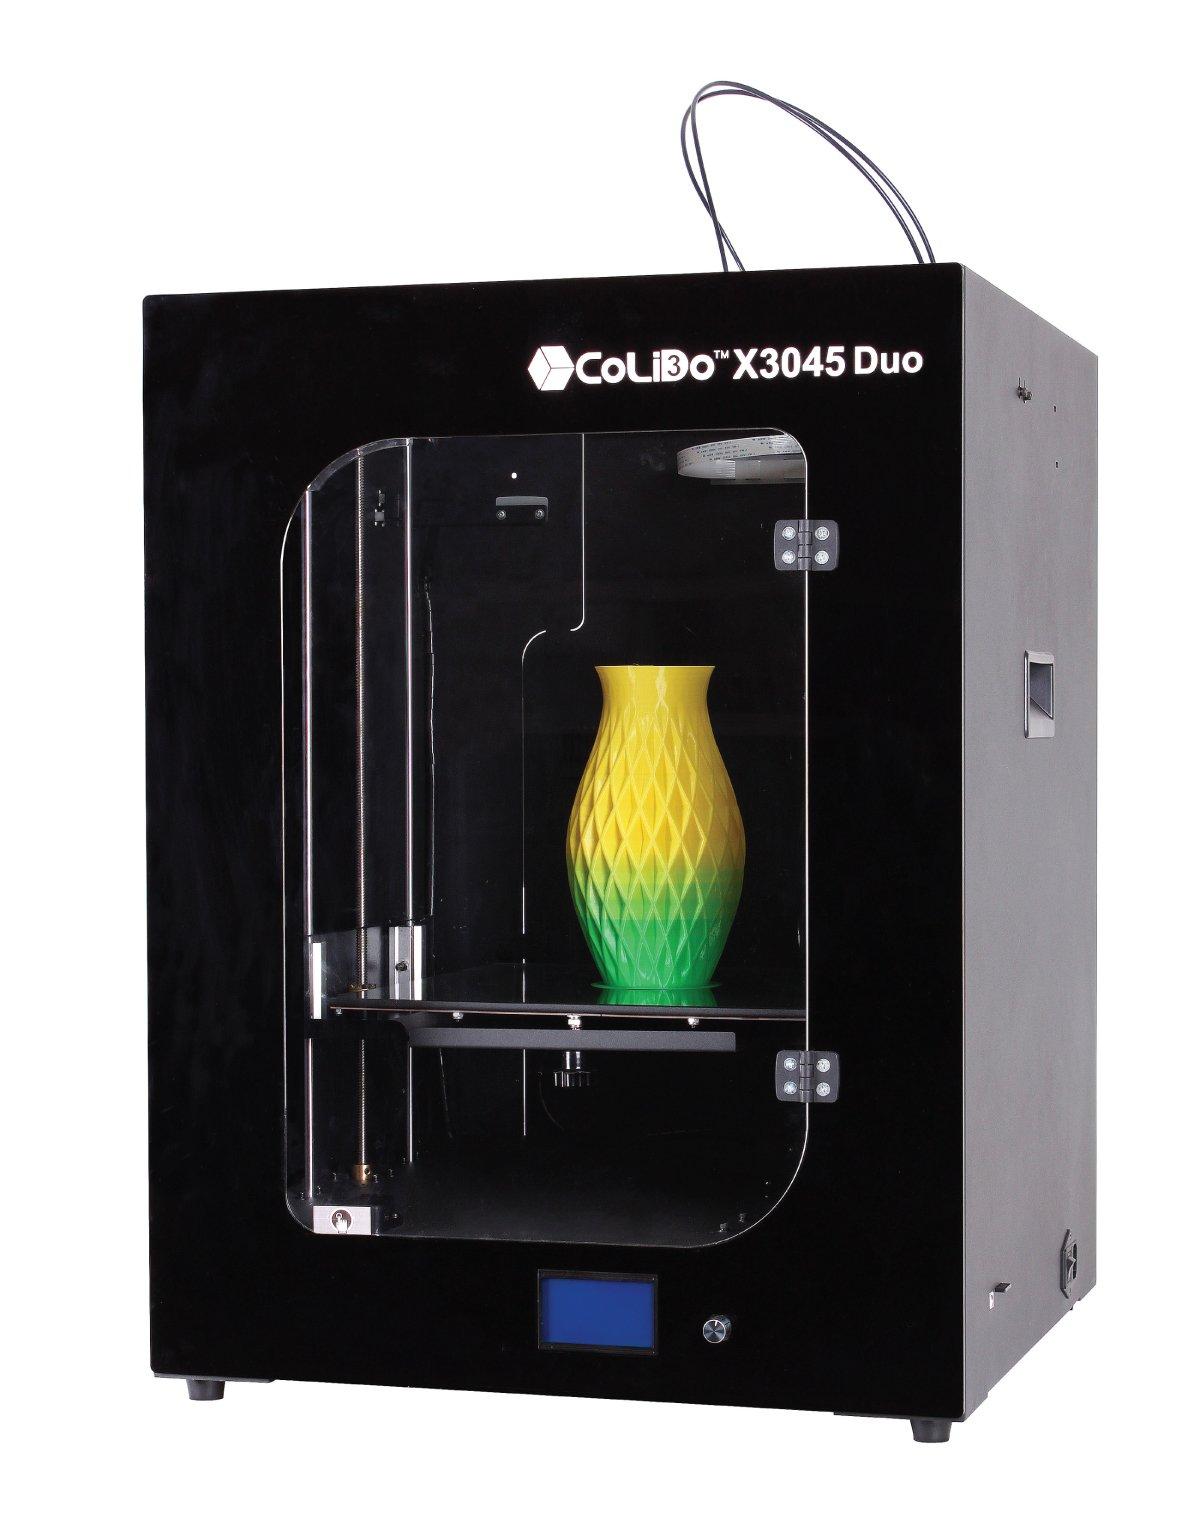 CoLiDo X3045 Duo 1